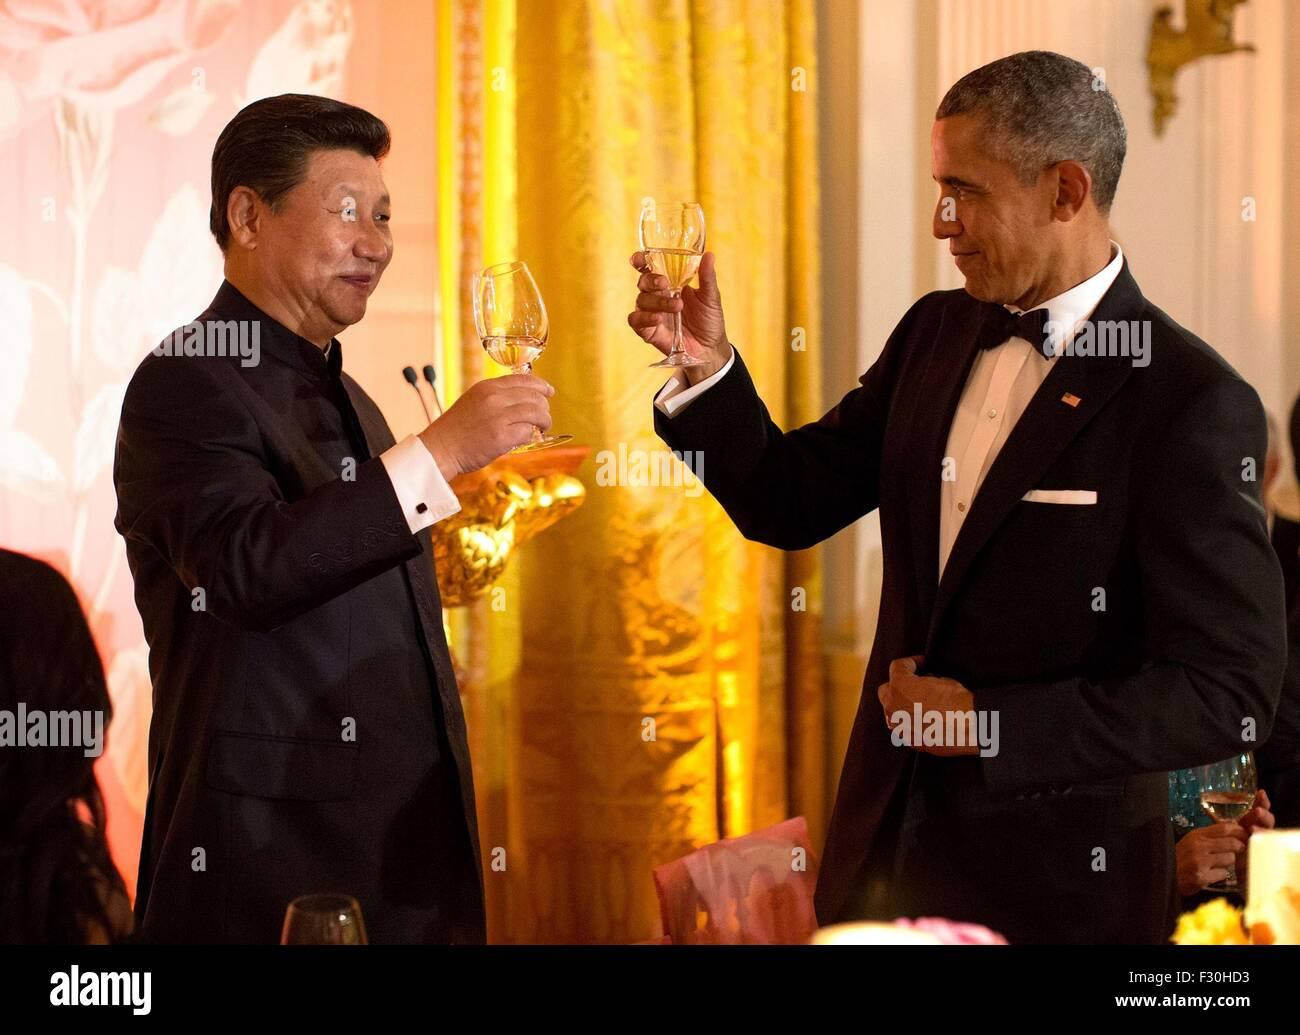 Washington DC, US. 25th Sep, 2015. U.S. President Barack Obama toasts Chinese President Xi Jinping during the State - Stock Image